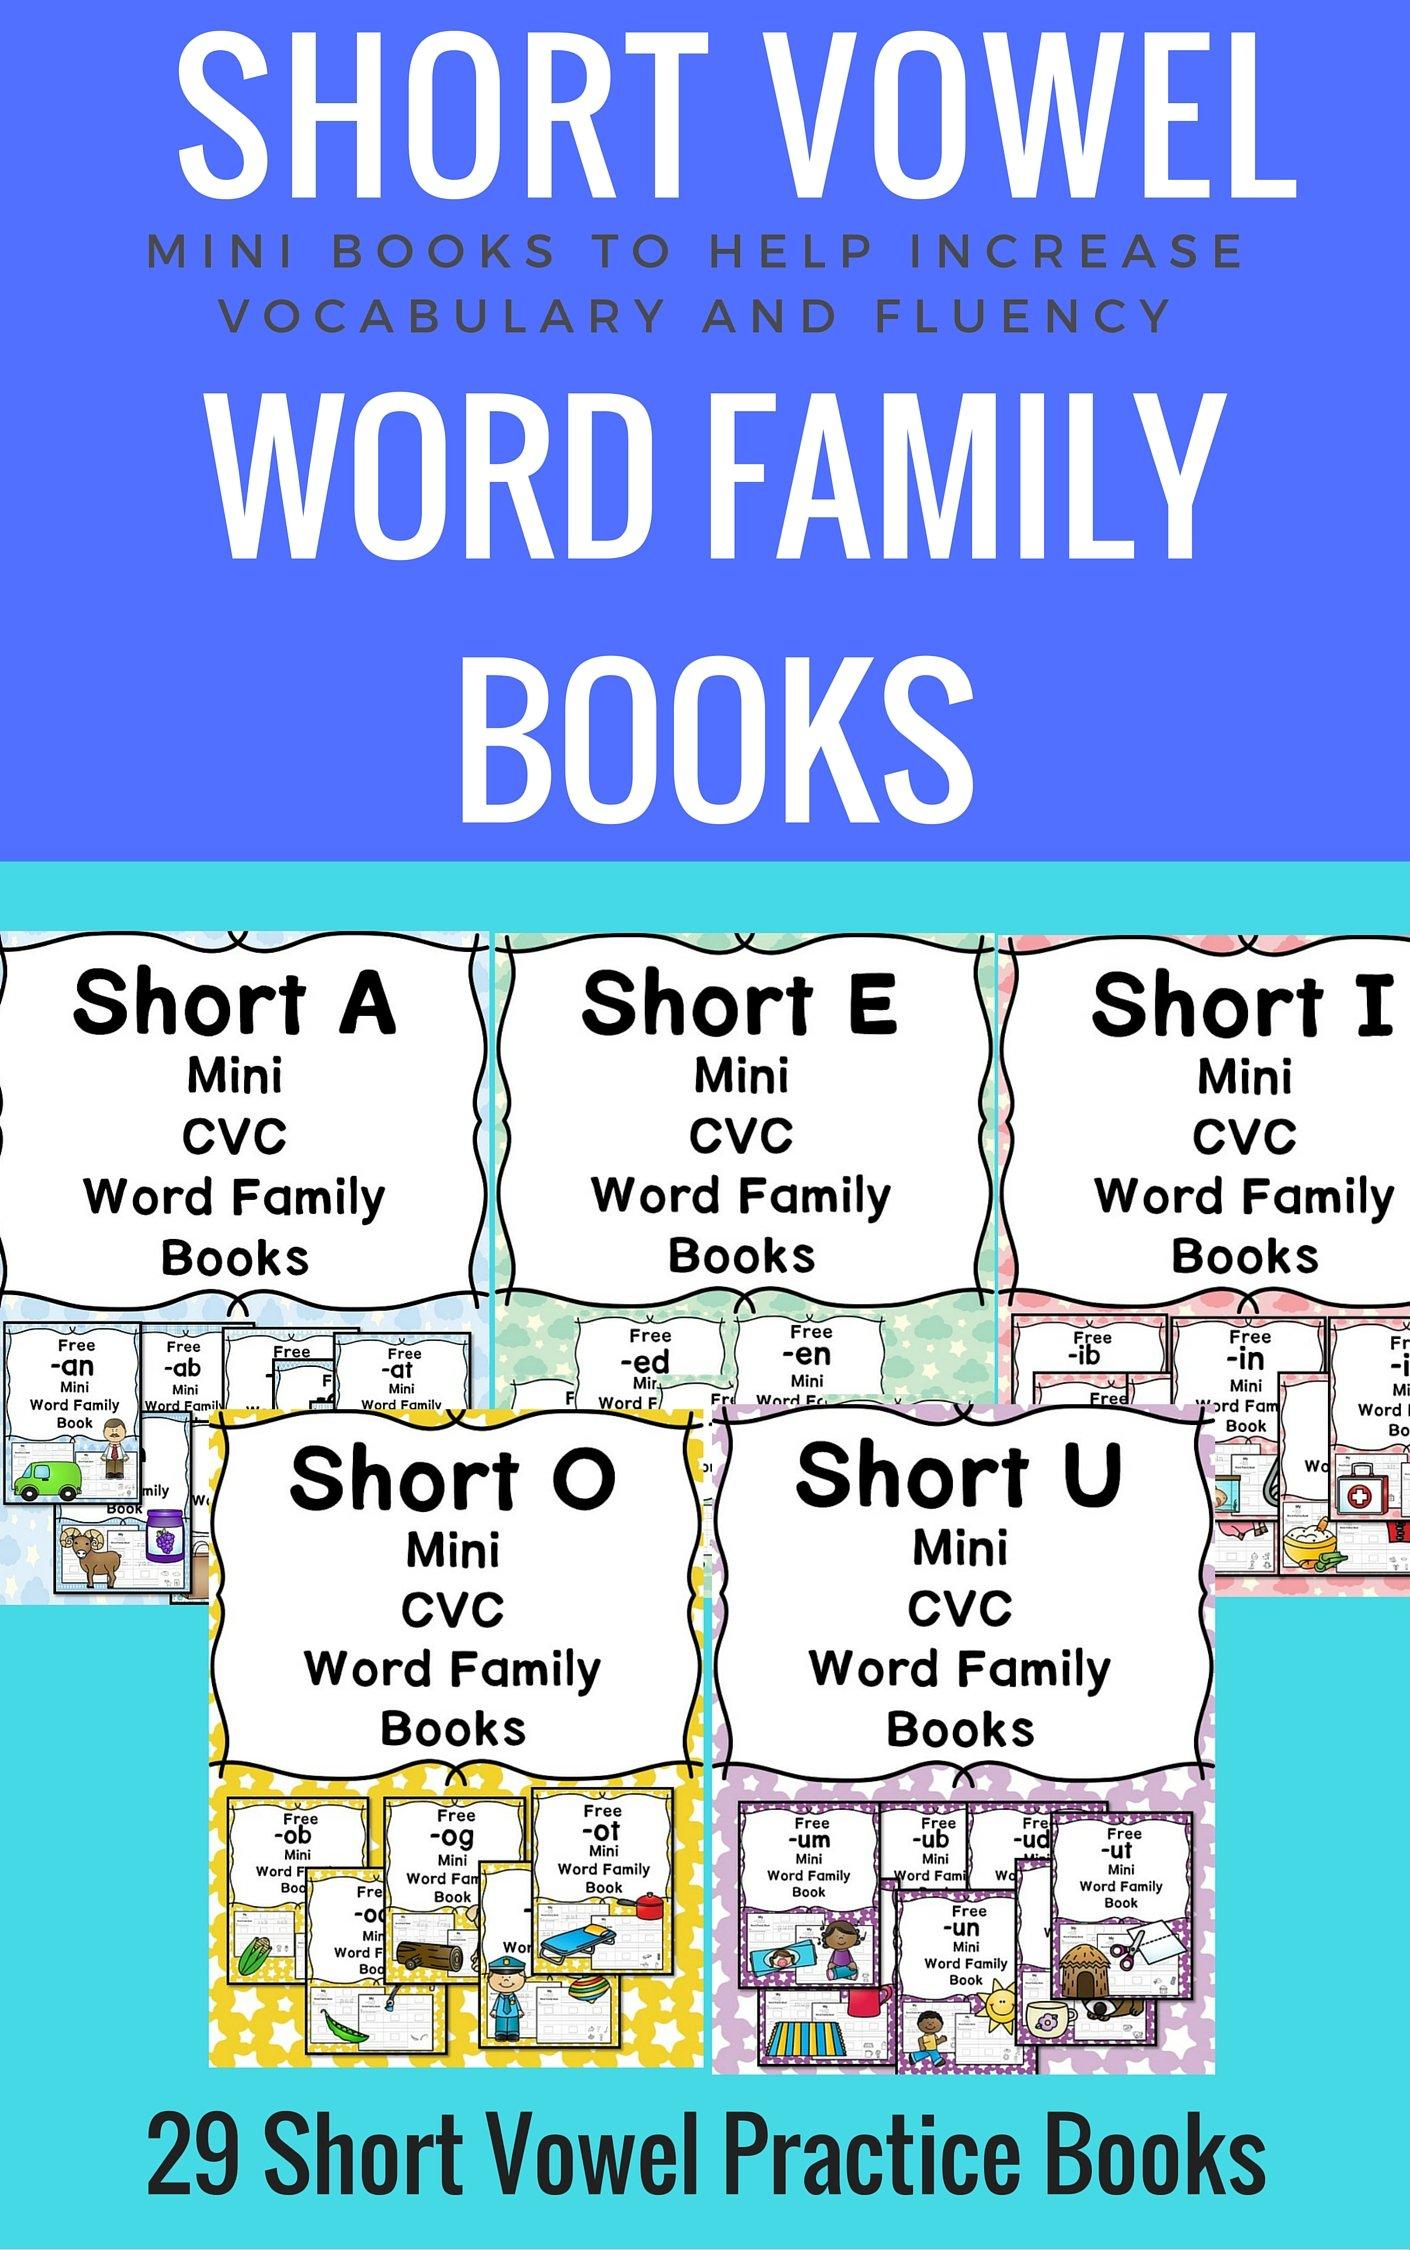 Short Vowel word family books: A bundle of mini-books to help teach short vowel word families